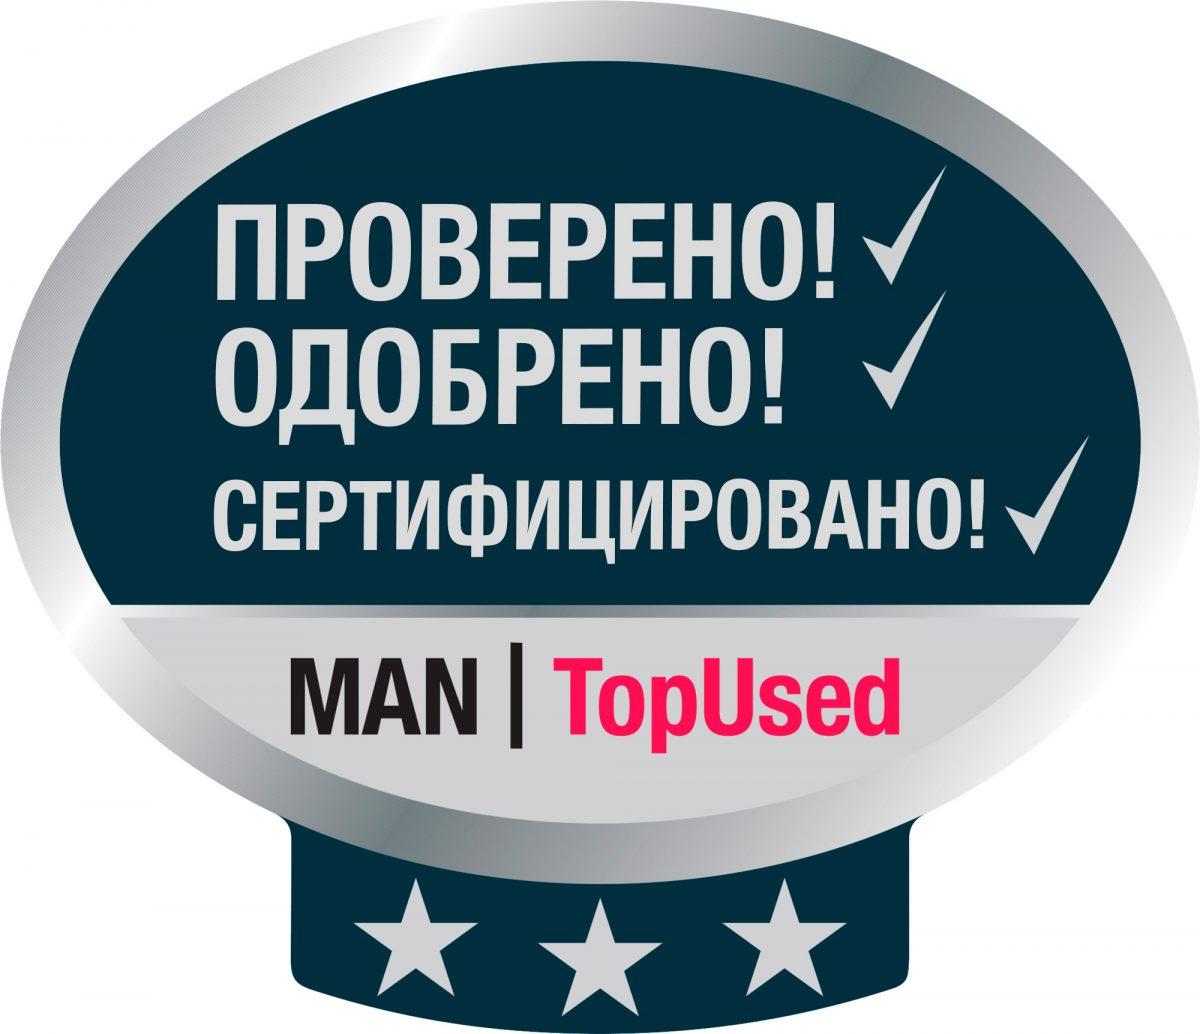 MAN_TopUsed_RUS фото